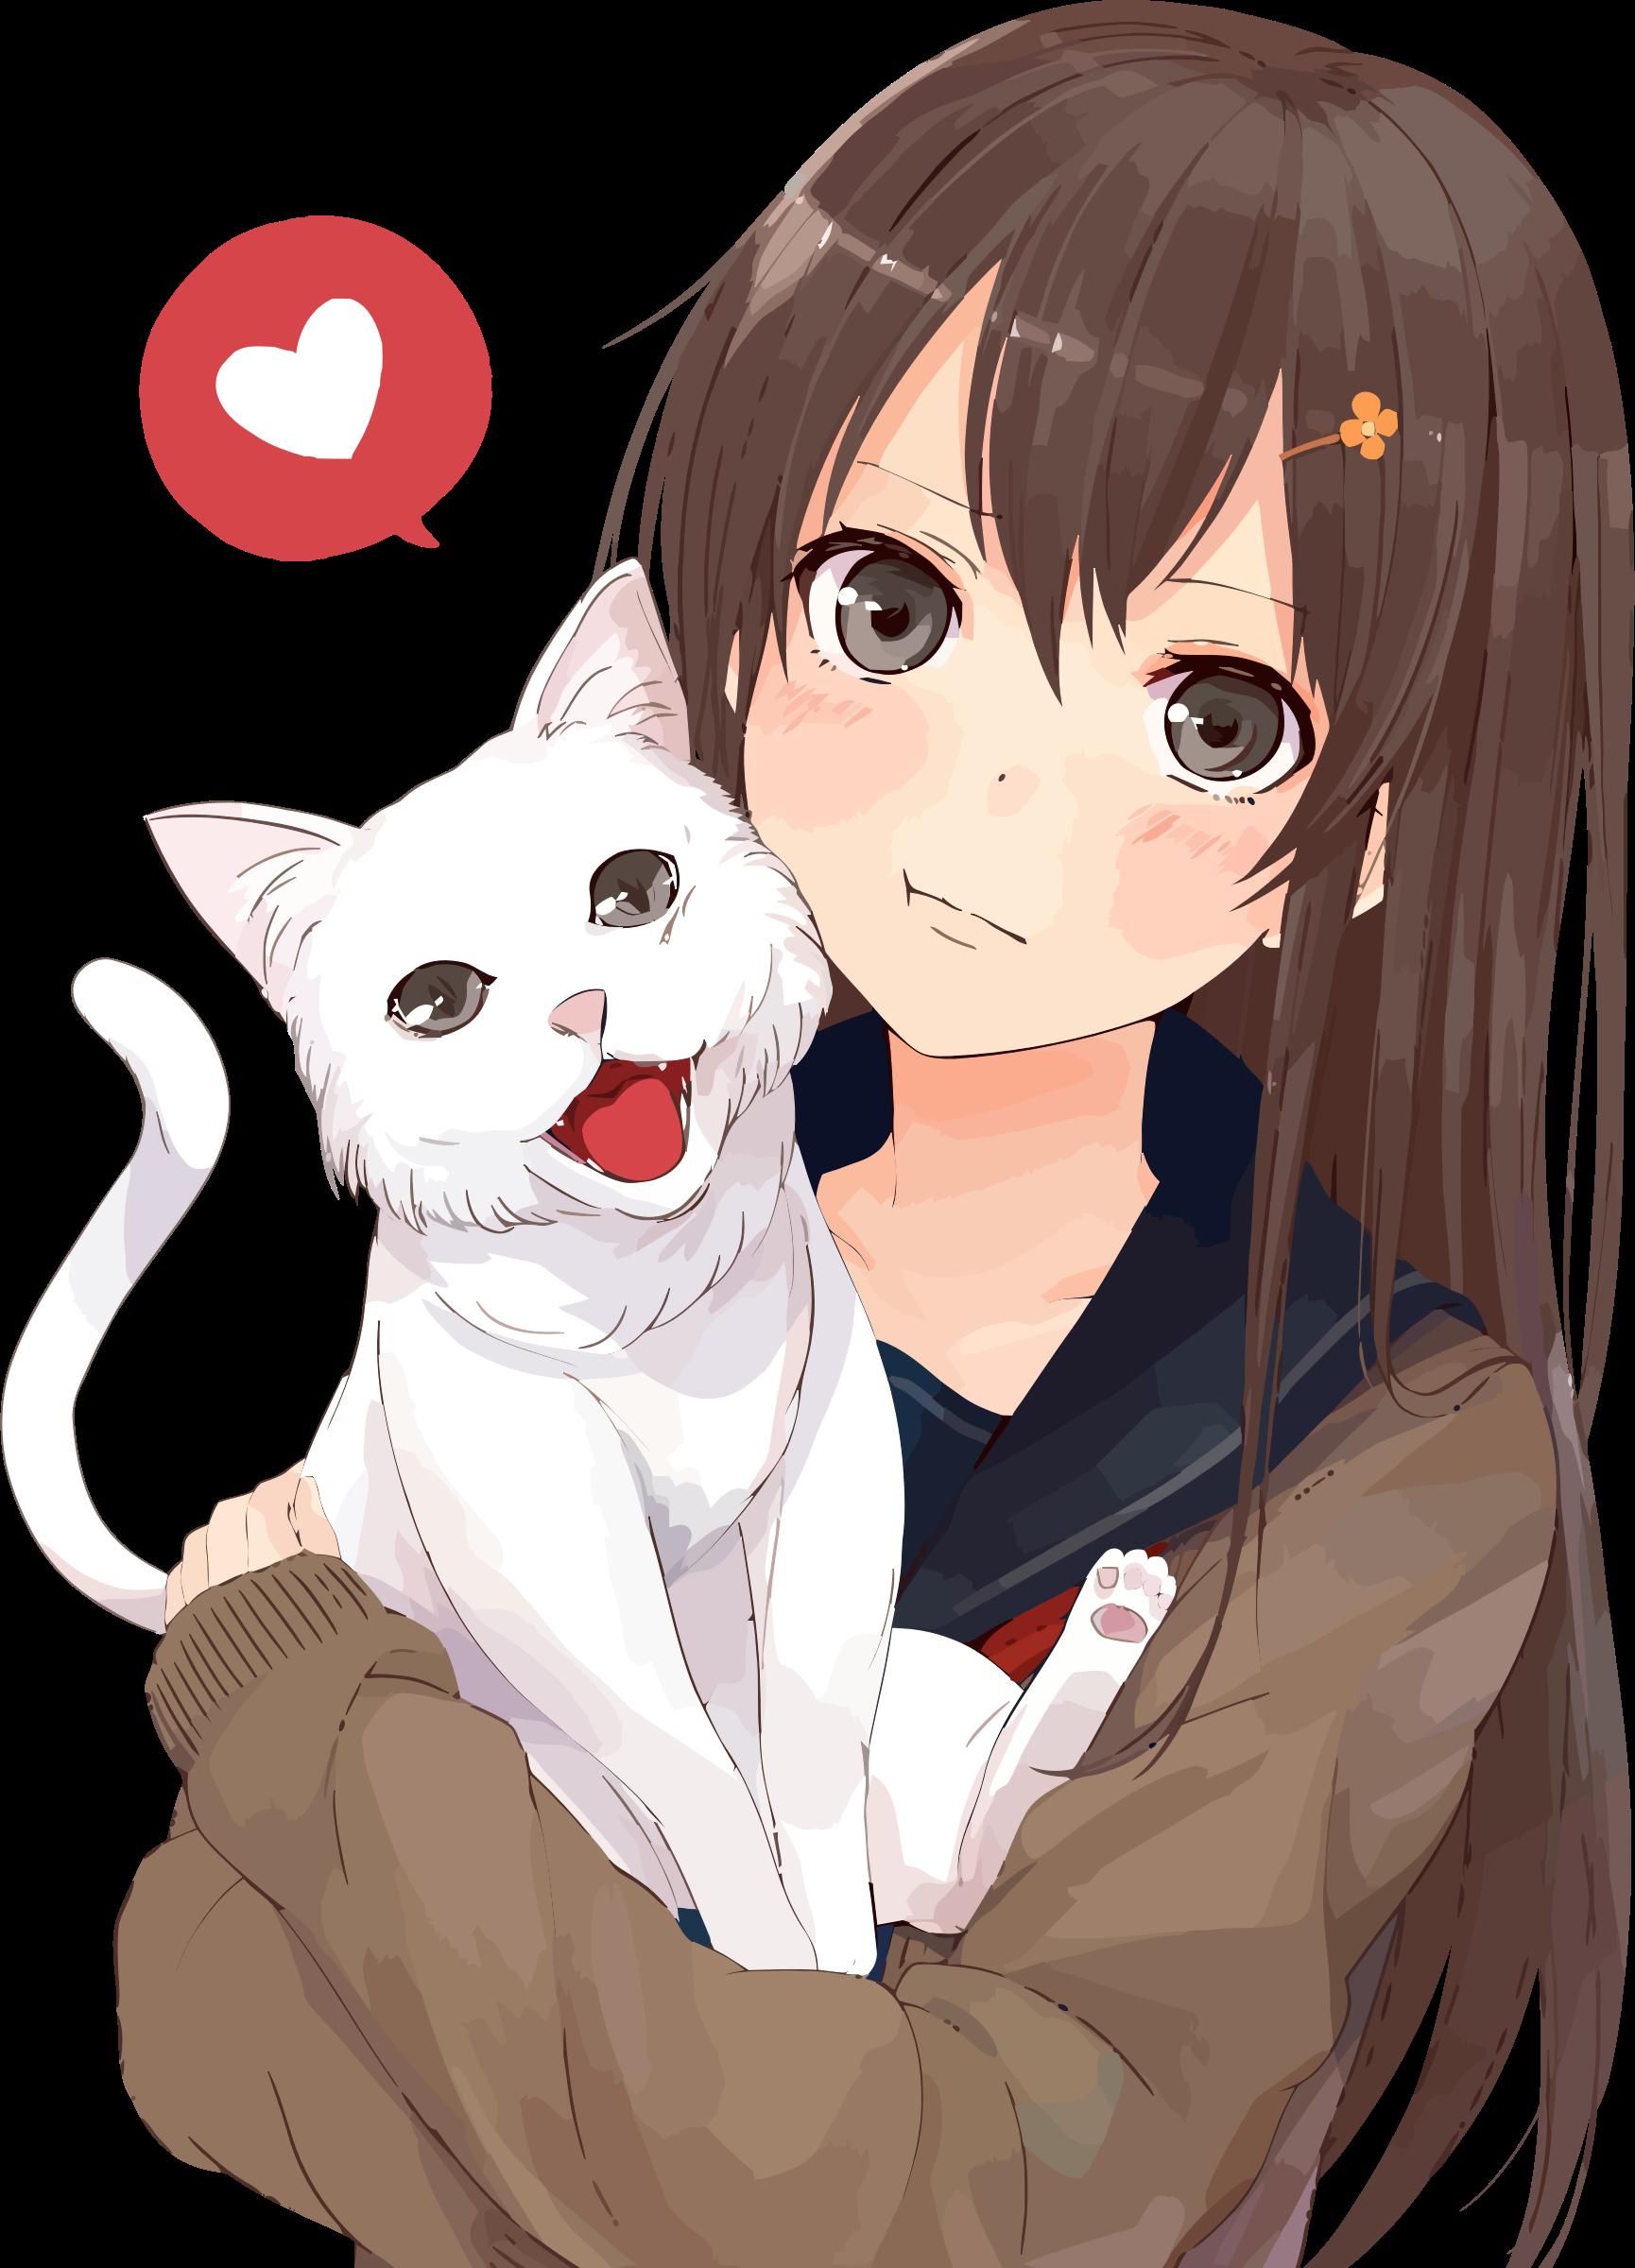 Girl with Cat Anime neko, Manga anime, Postacie z anime